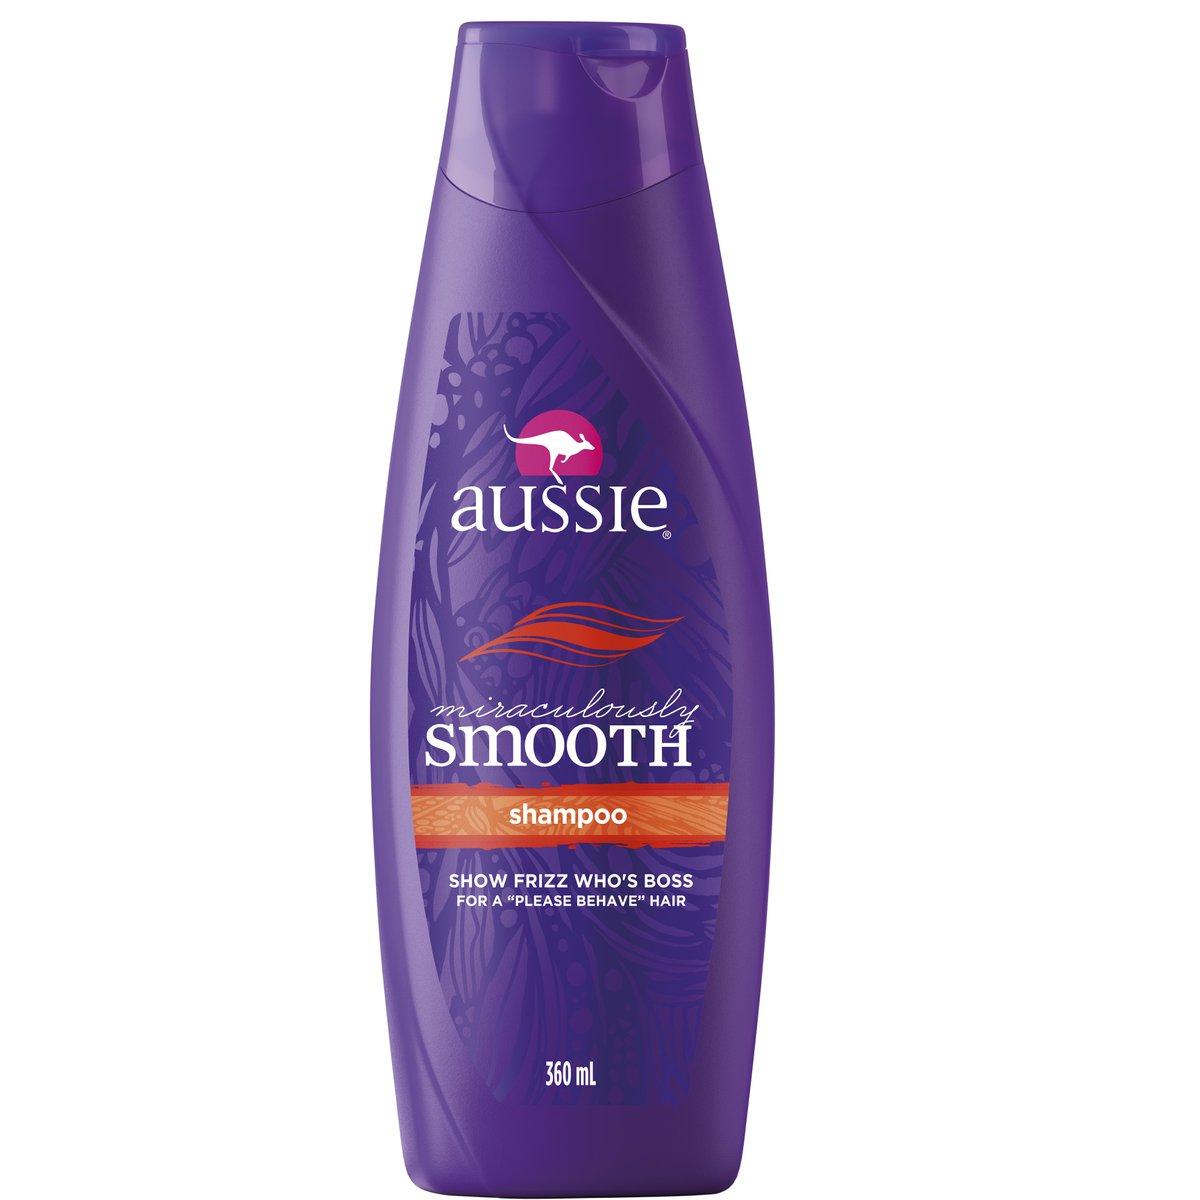 Aussie Shampoo Miraculously Smooth 360 mL